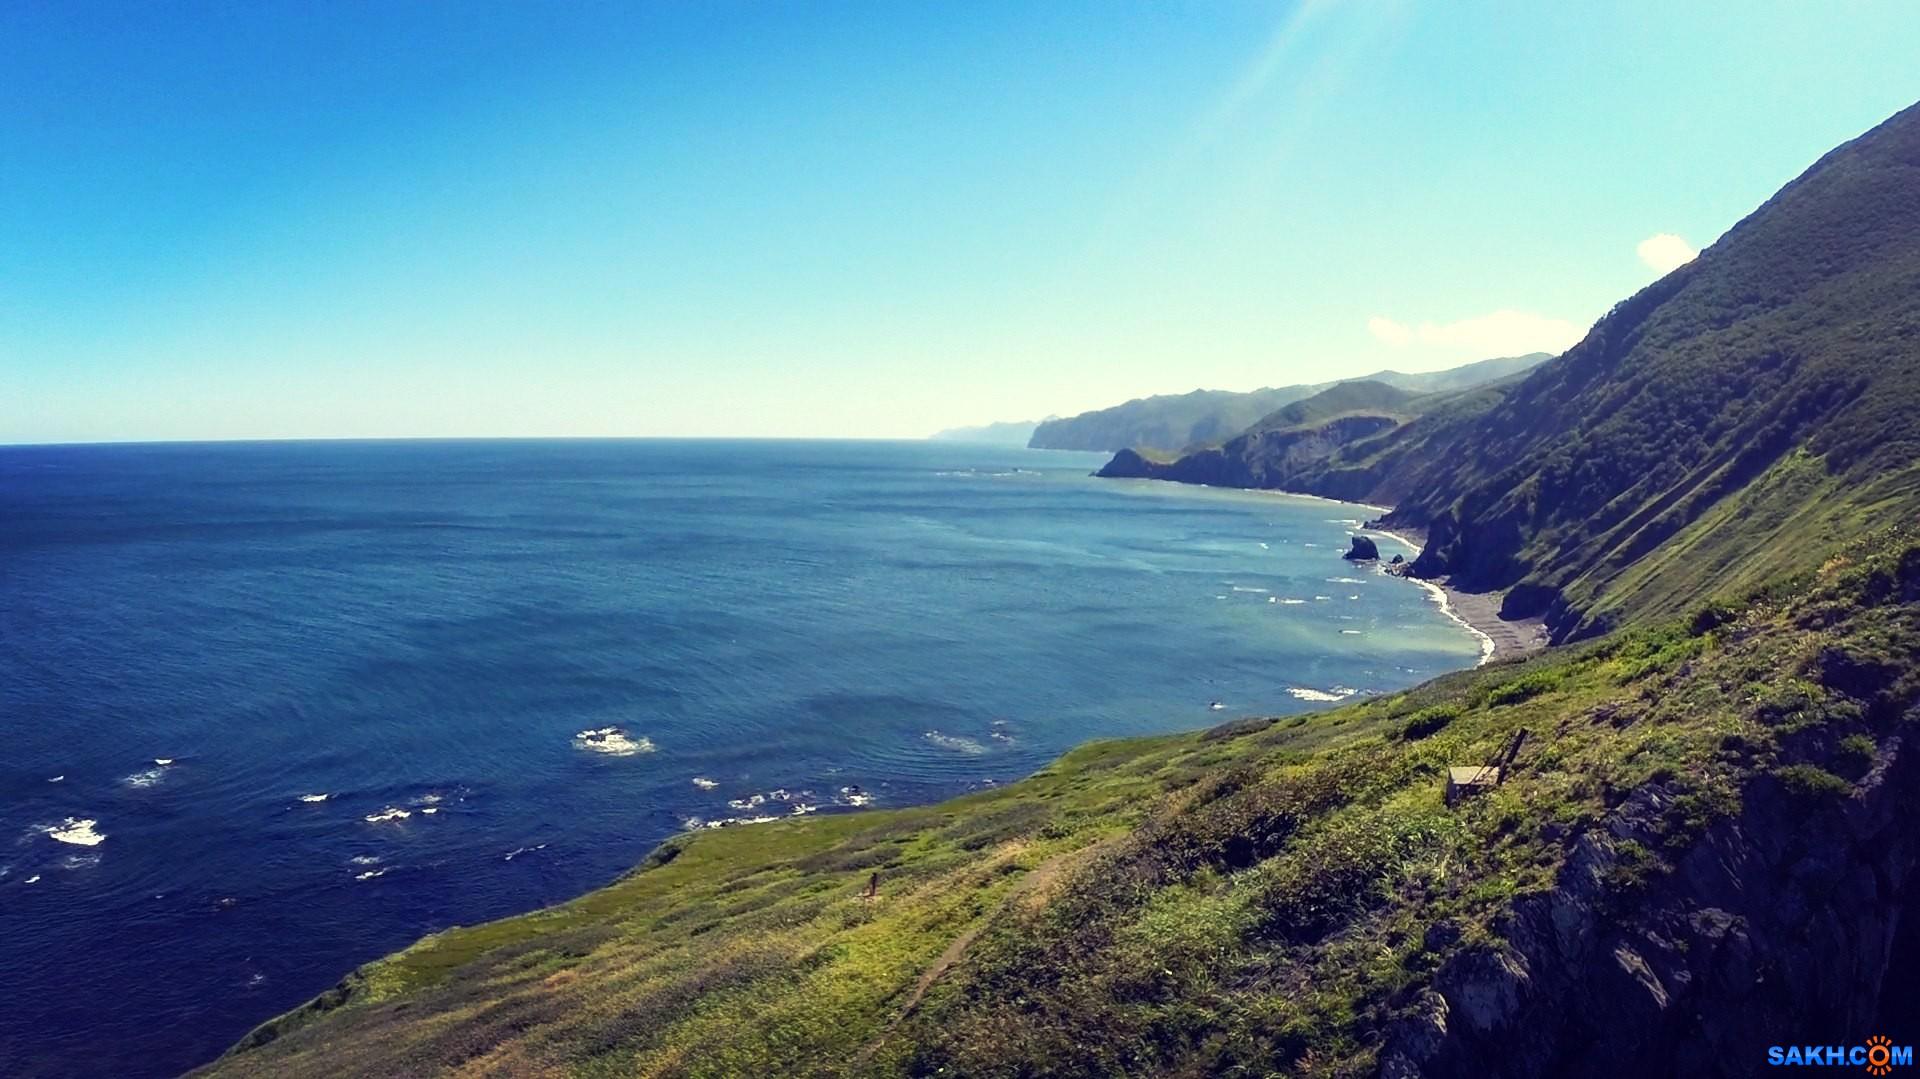 uver: Вид на юг с мыса св.Елизаветы полуострова Шмидта